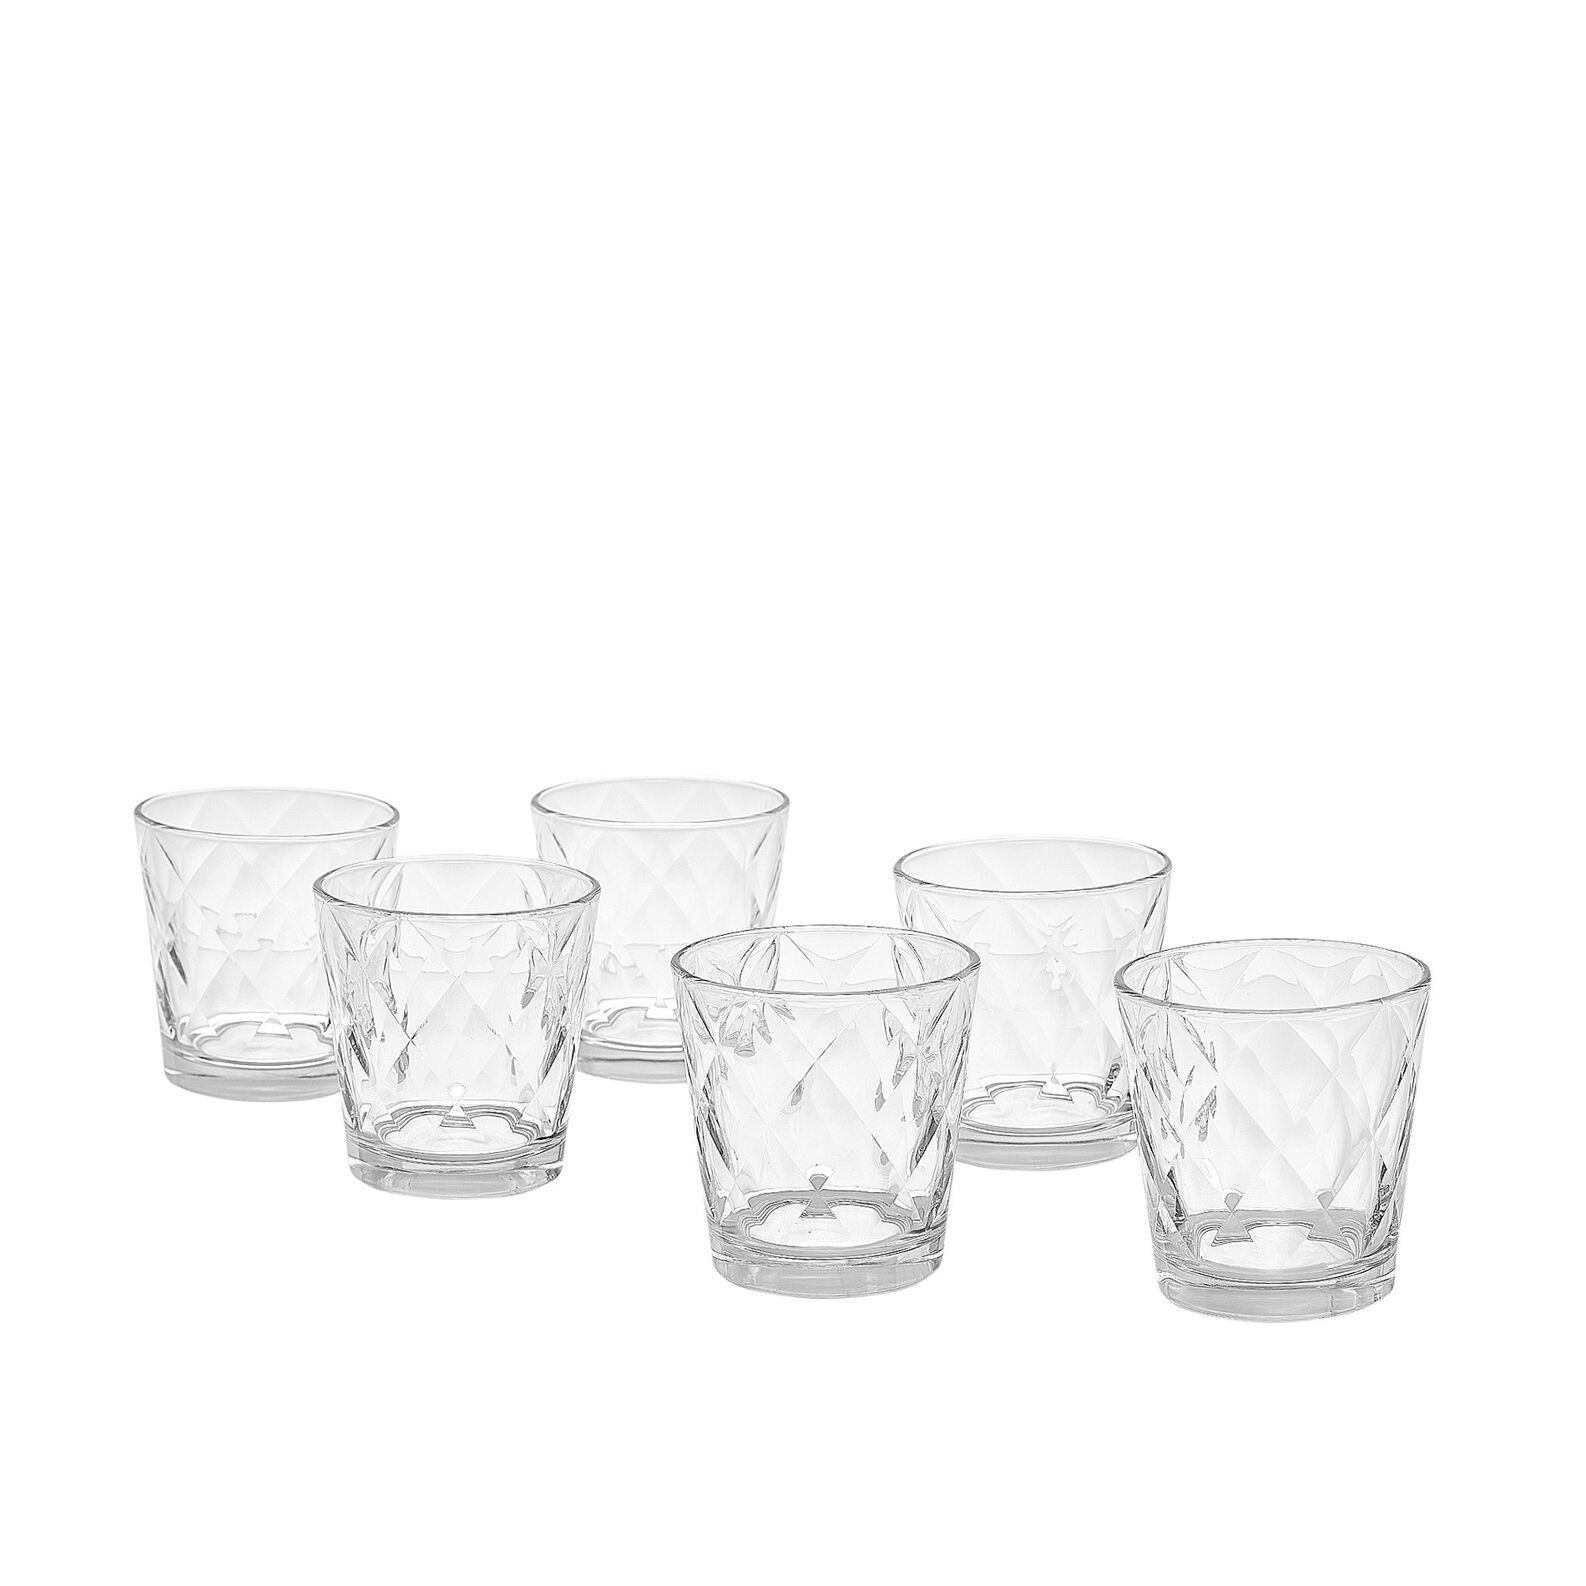 Set of 6 tumblers in Kaleido glass